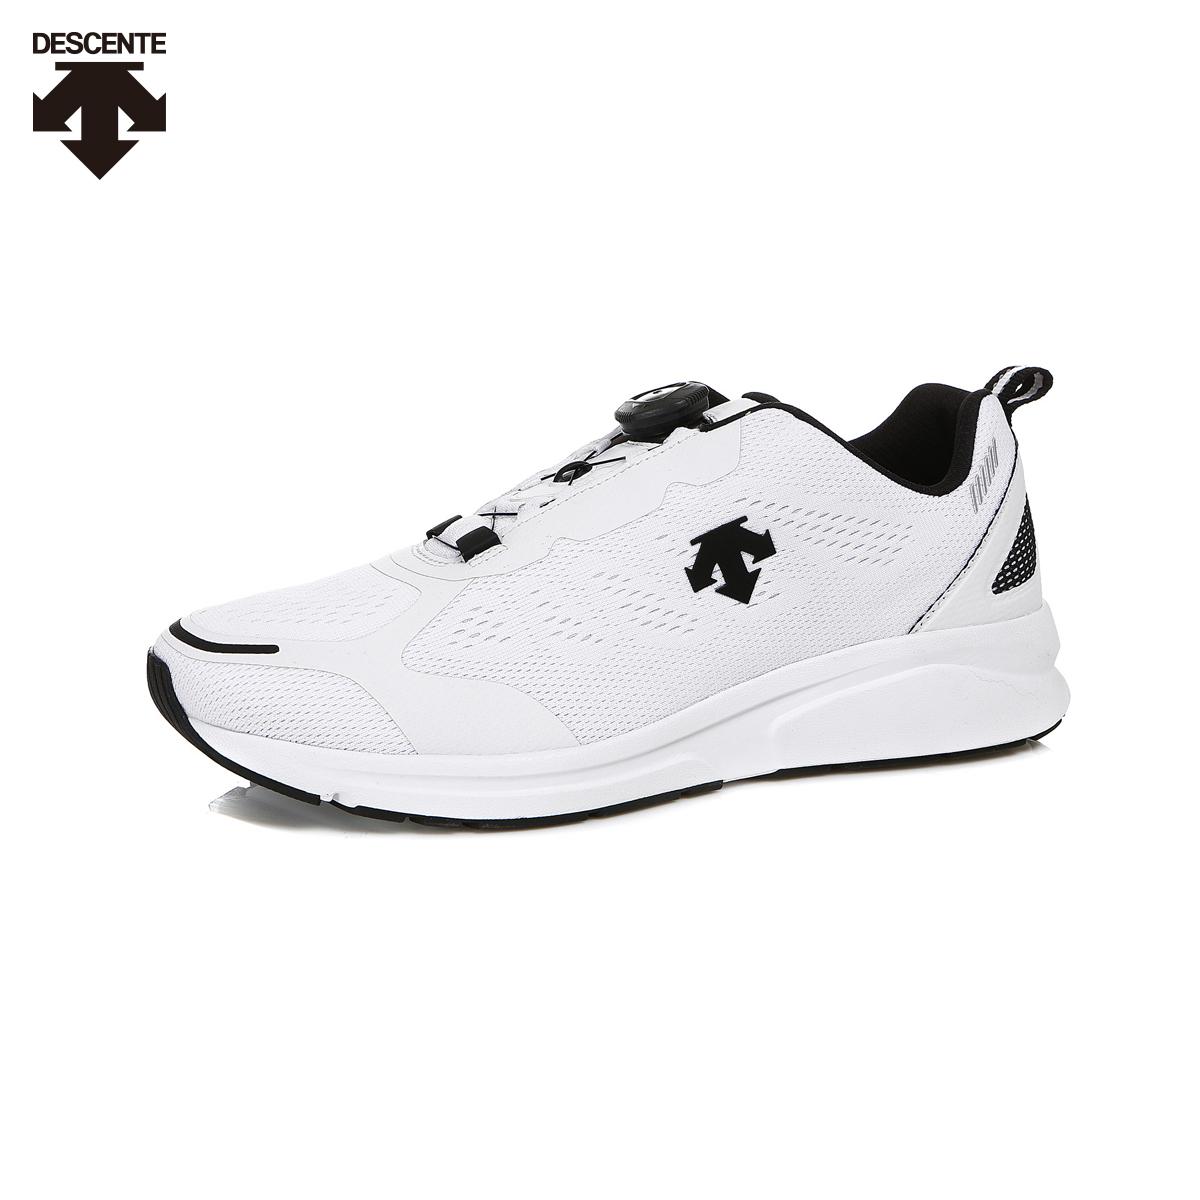 DSECENTE迪桑特男鞋 BLAZE WIRE 男女款跑步运动鞋 D8129RRN46